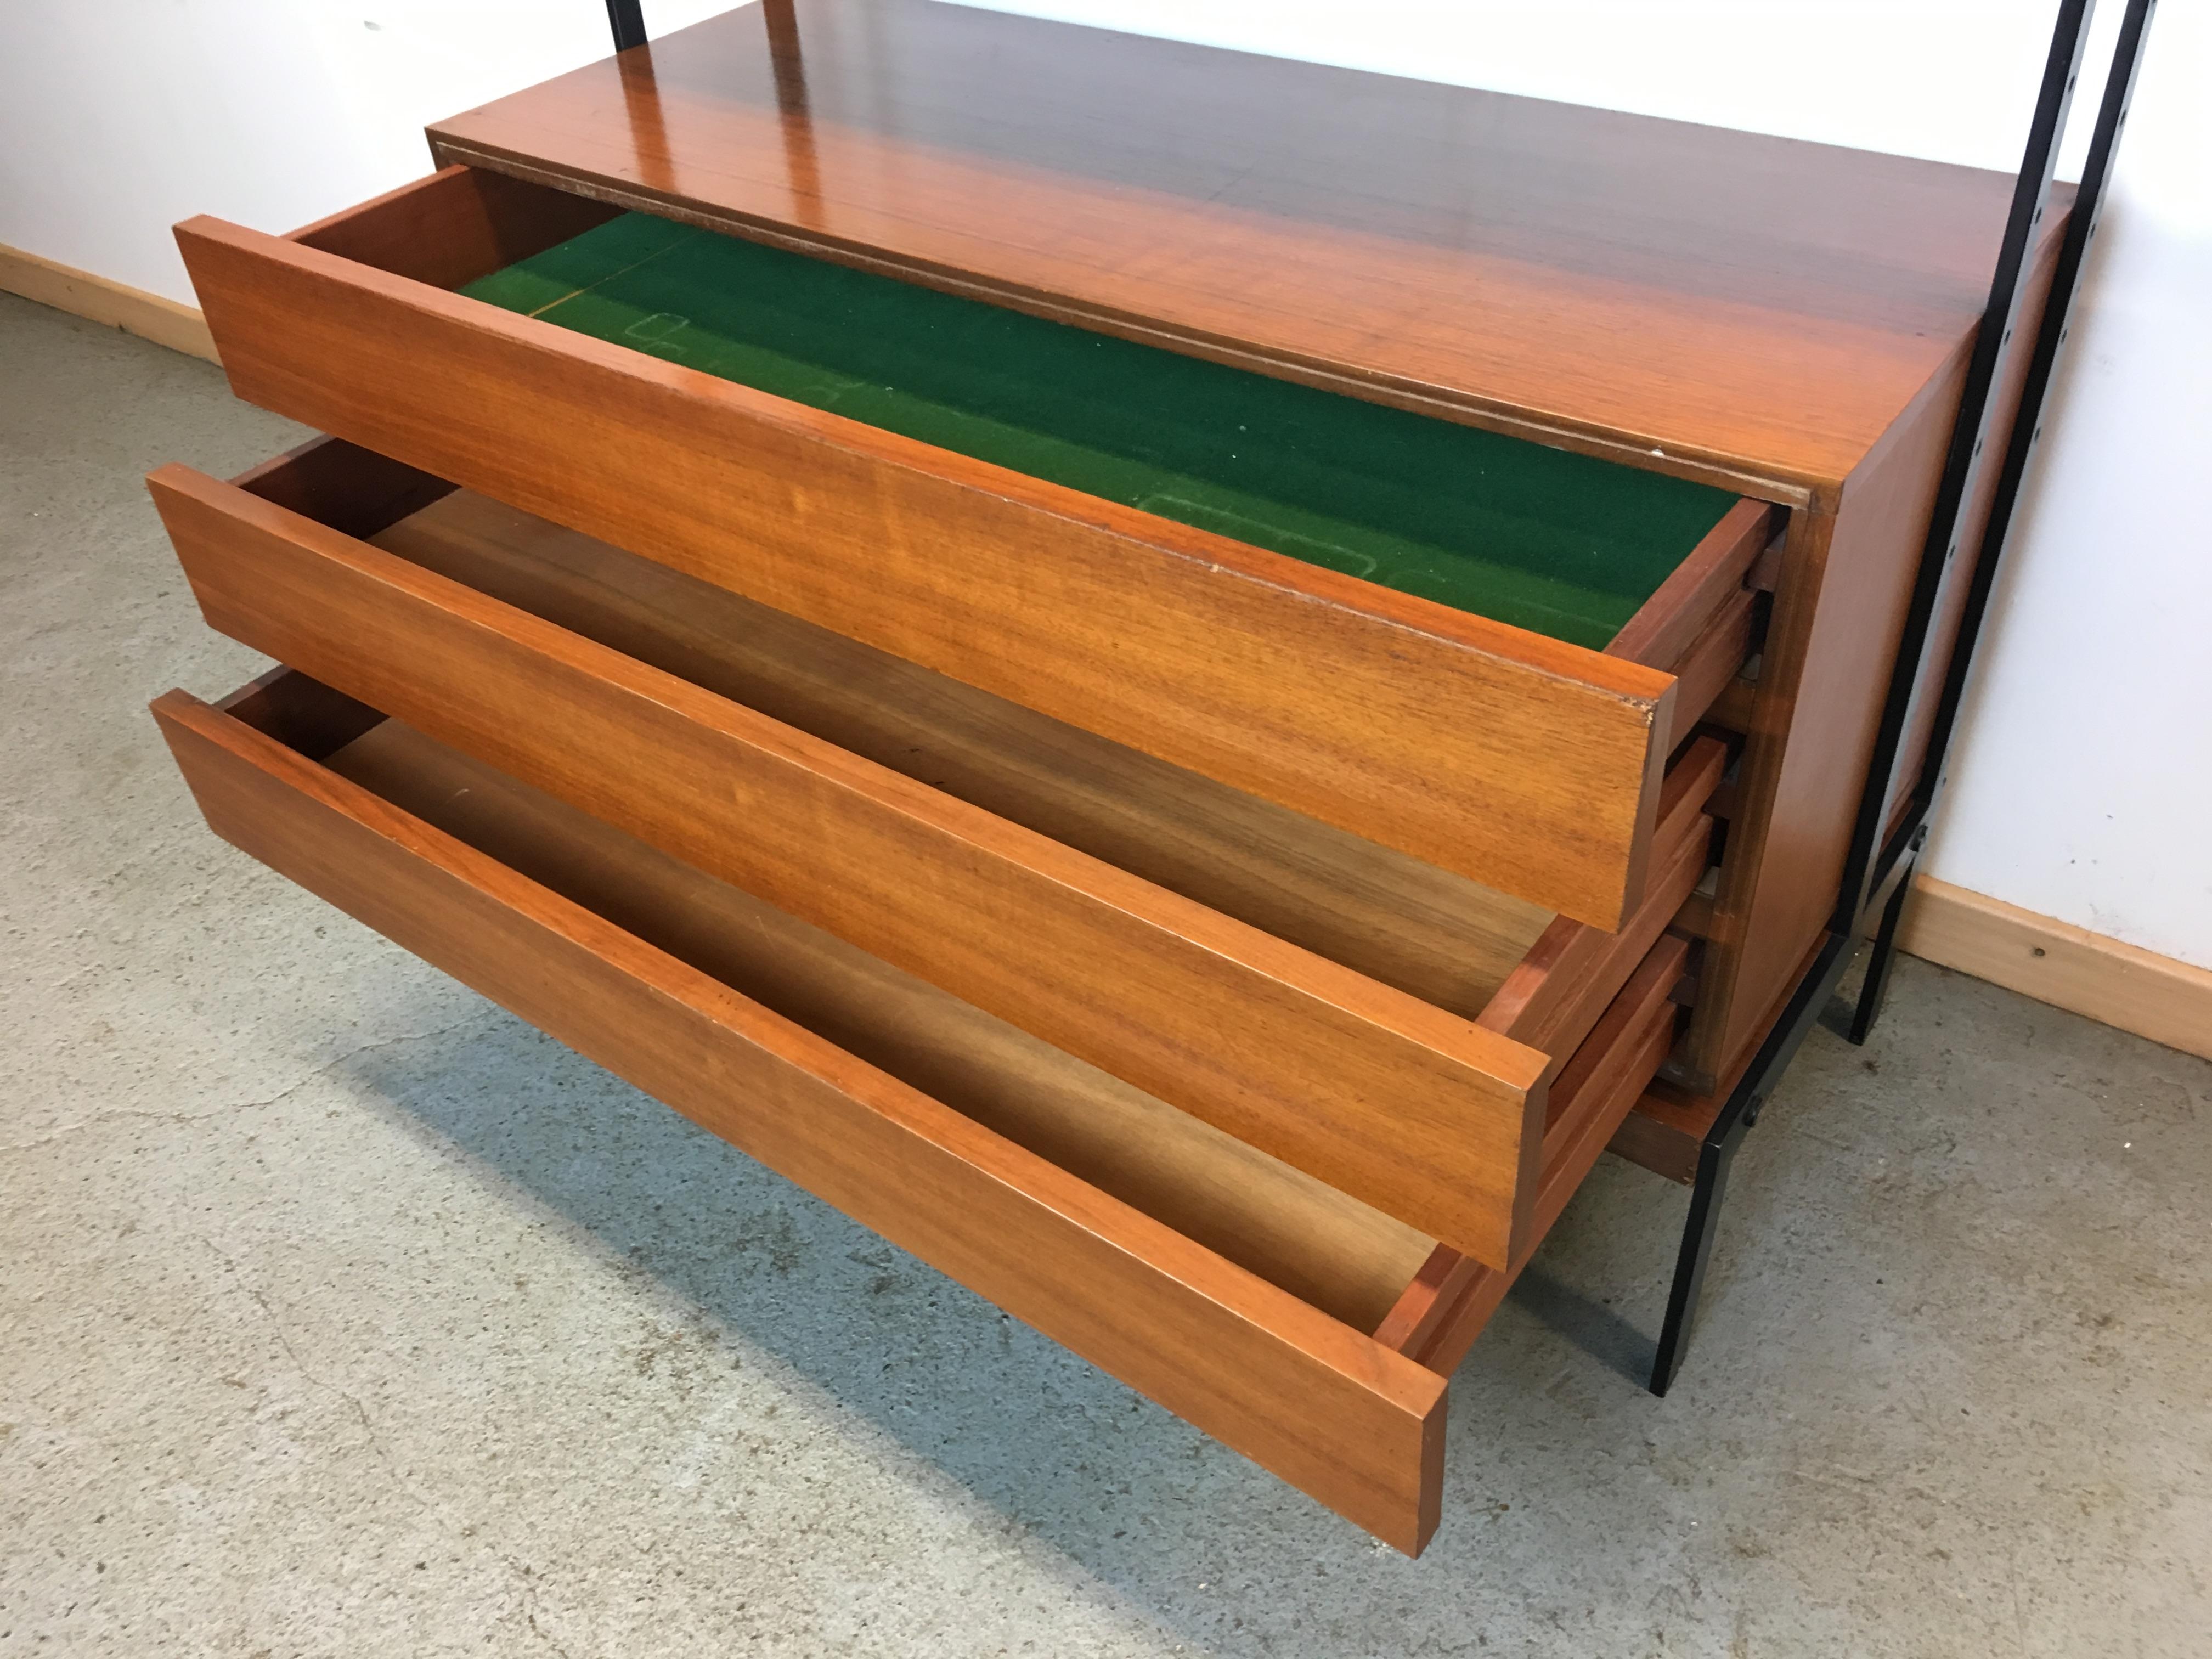 biblioth que modulable ann e 60 vintage wall unit system switzerland 60 s. Black Bedroom Furniture Sets. Home Design Ideas